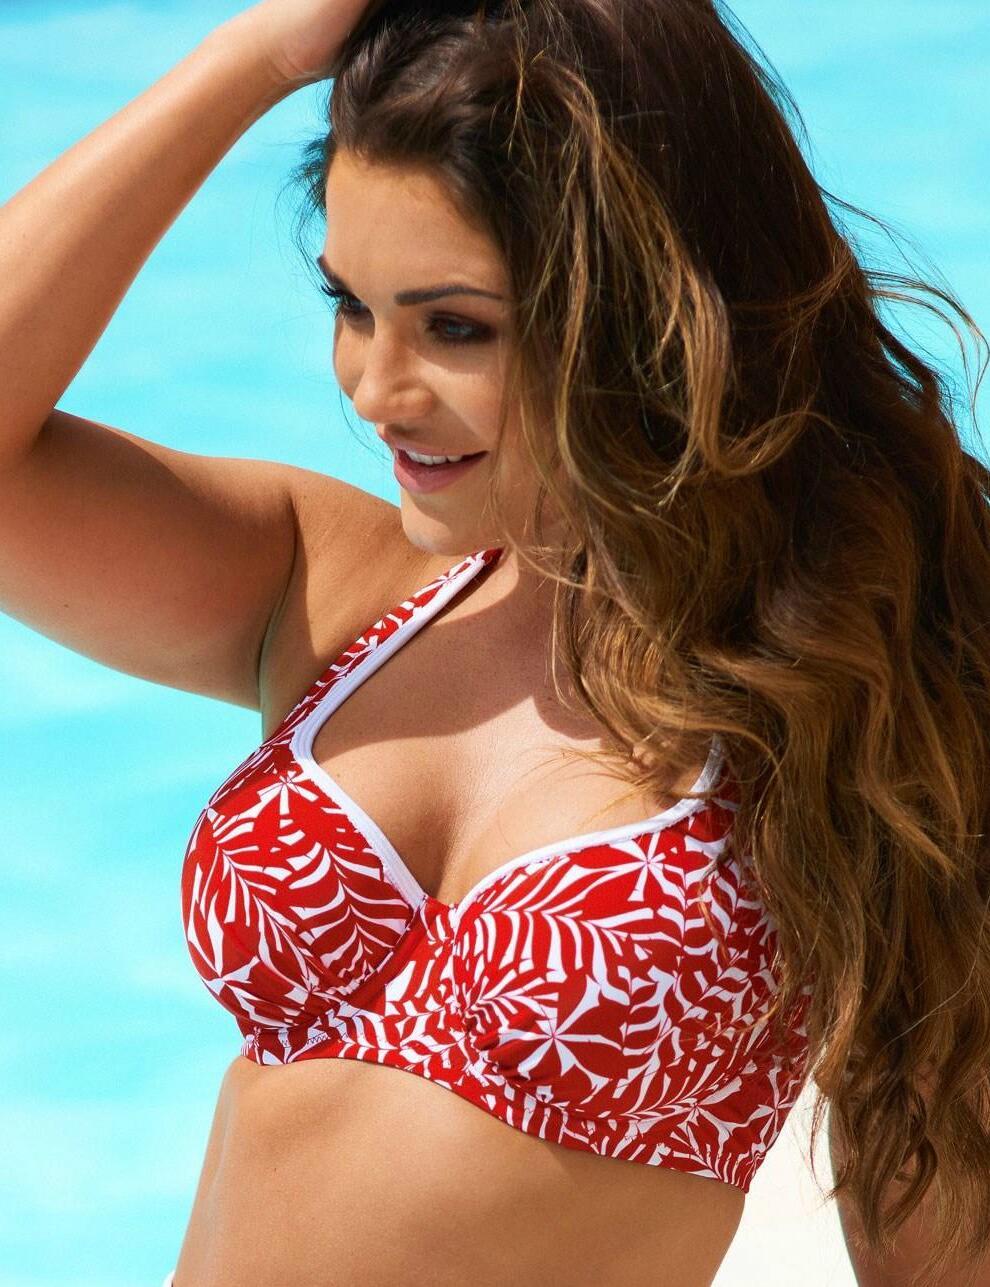 37002 Pour Moi Fiesta Halter Underwired Bikini Top - 37002 Red/White